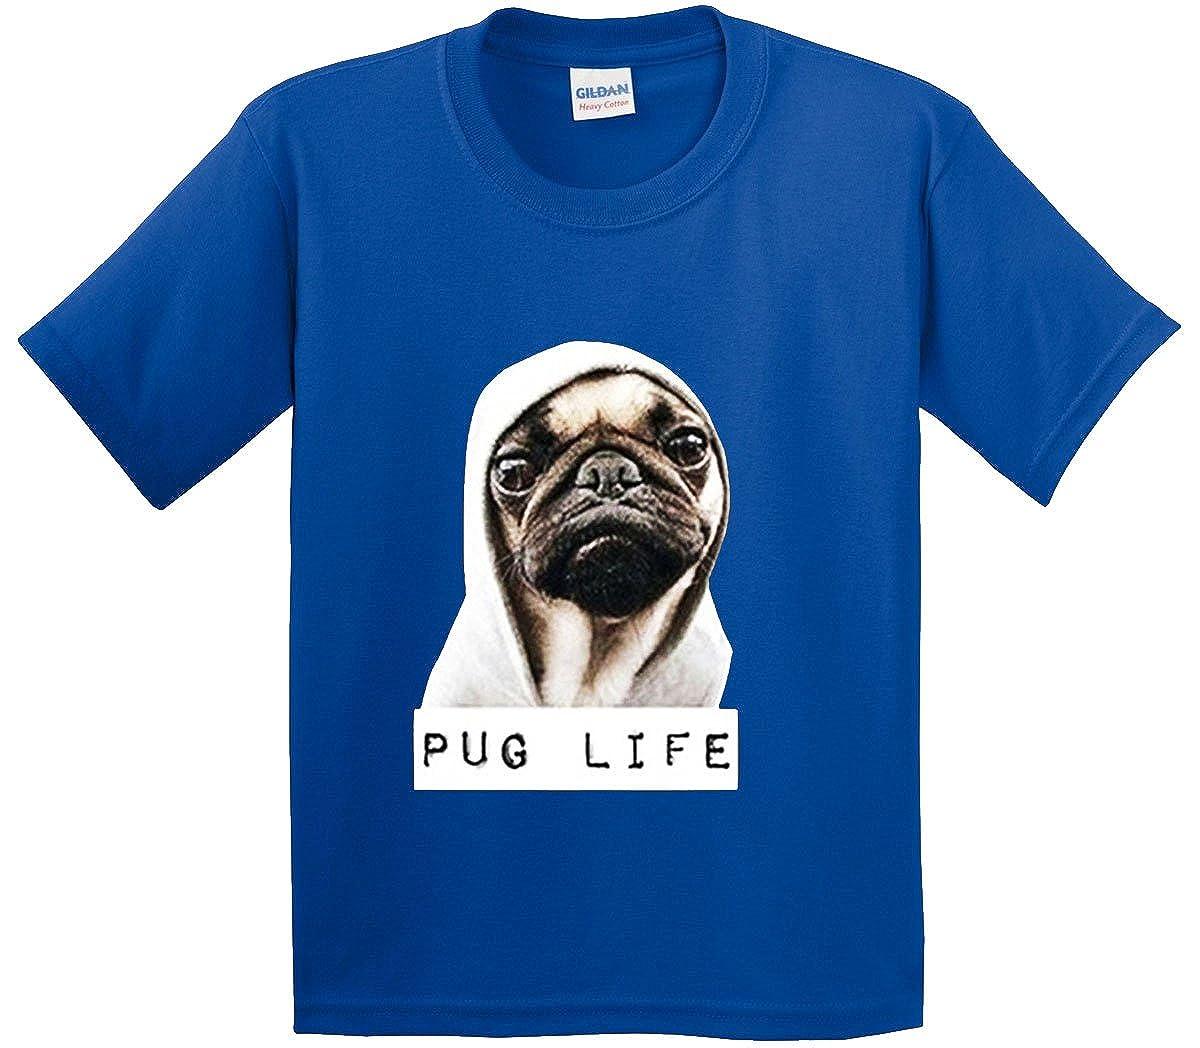 014 Pug Life Wearing 6126 Shirts